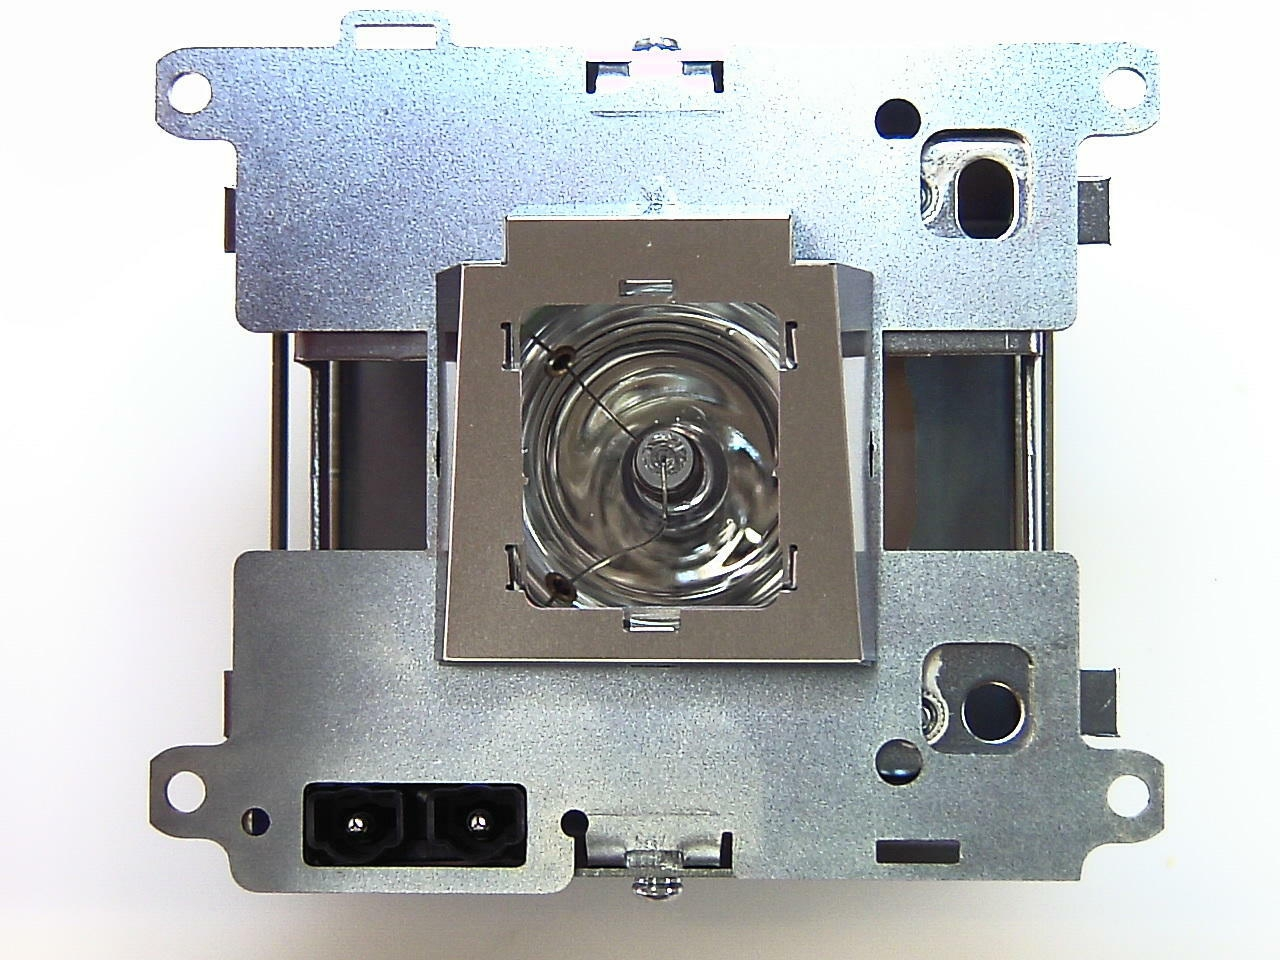 Original Simple Lámpara For DIGITAL PROJECTION TITAN 1080P-3D Proyector.